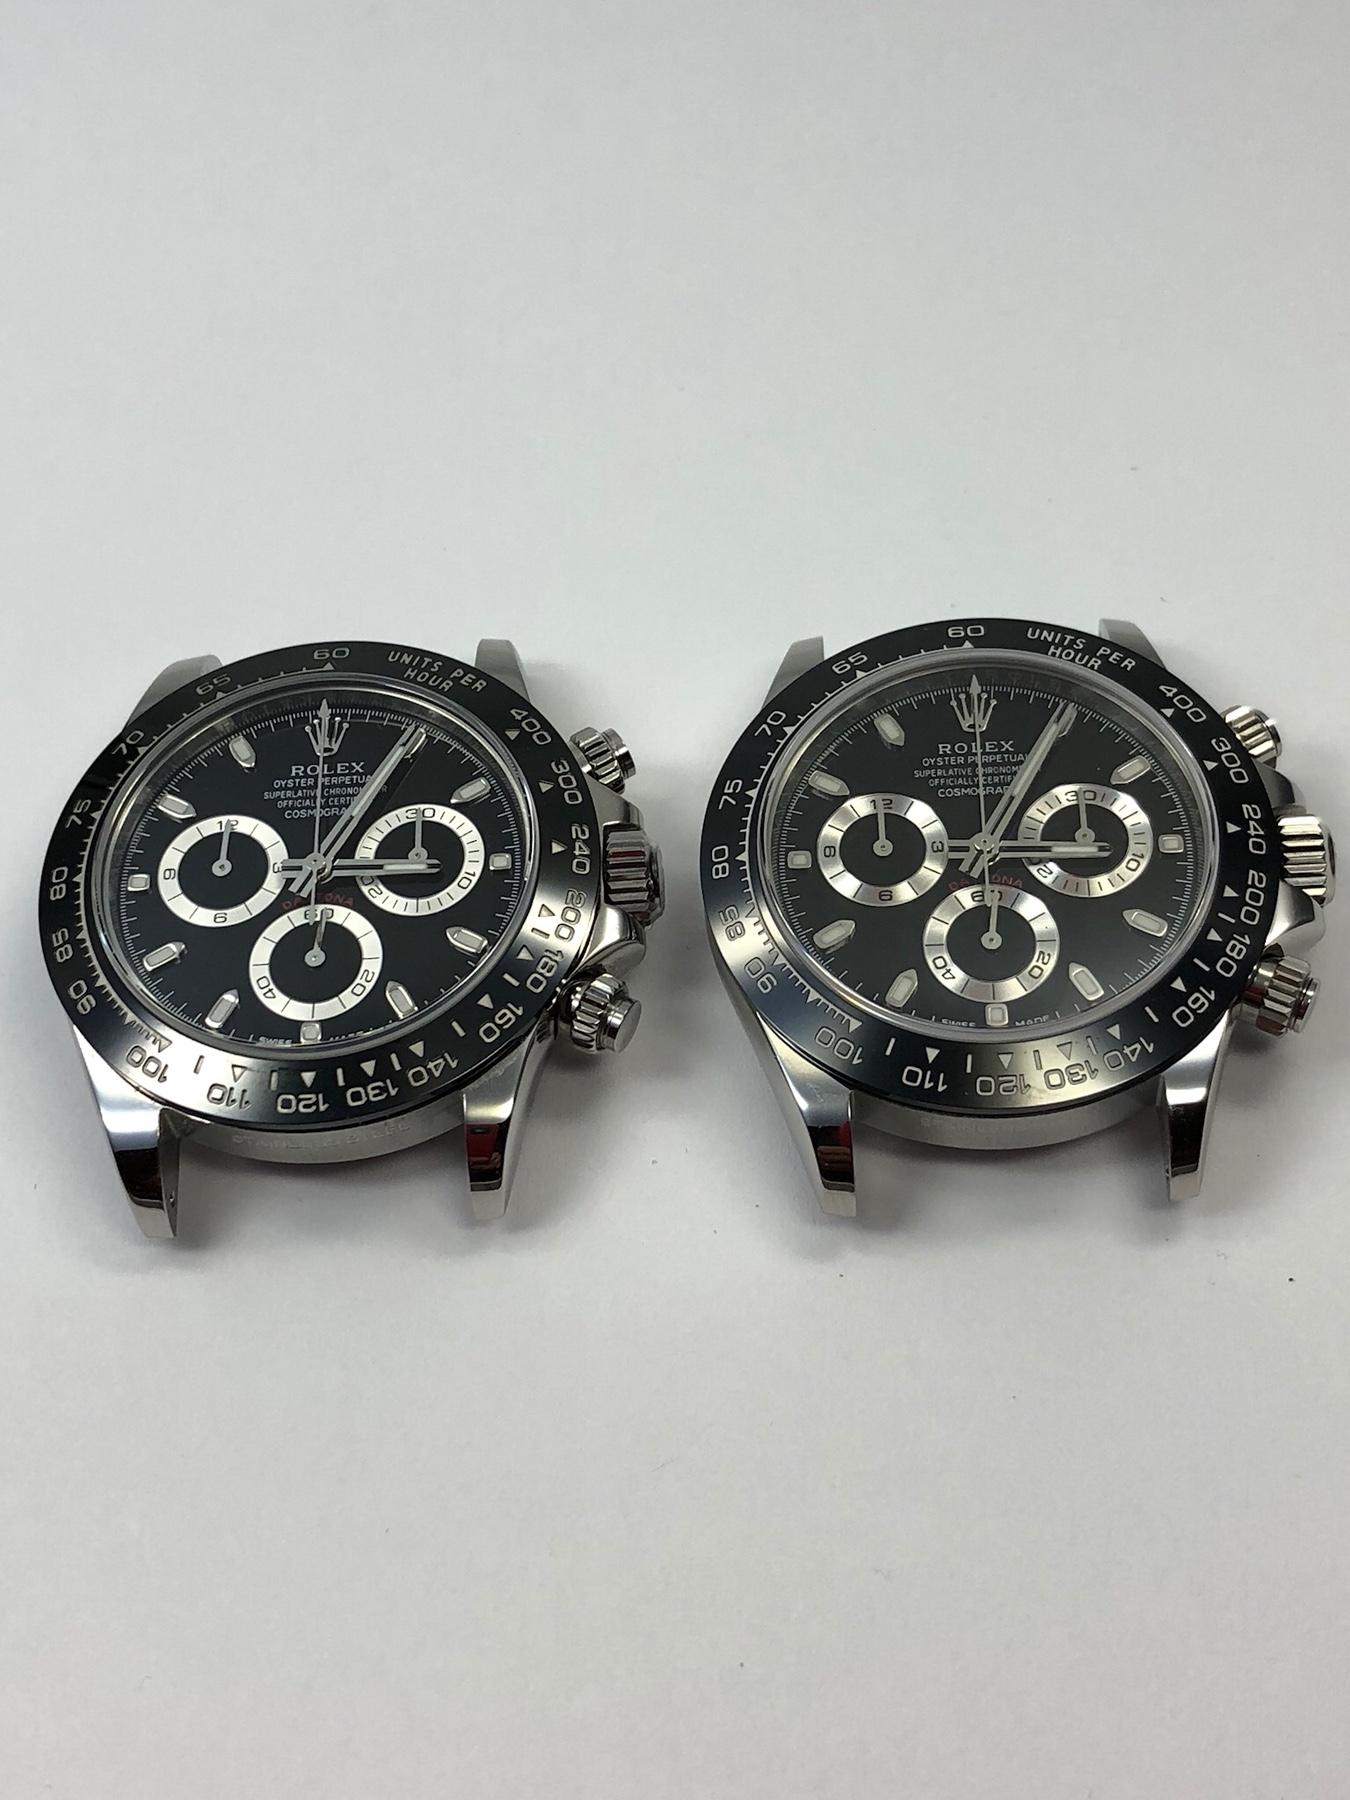 Noob Daytona vs ARF Daytona - Replica Watch Info